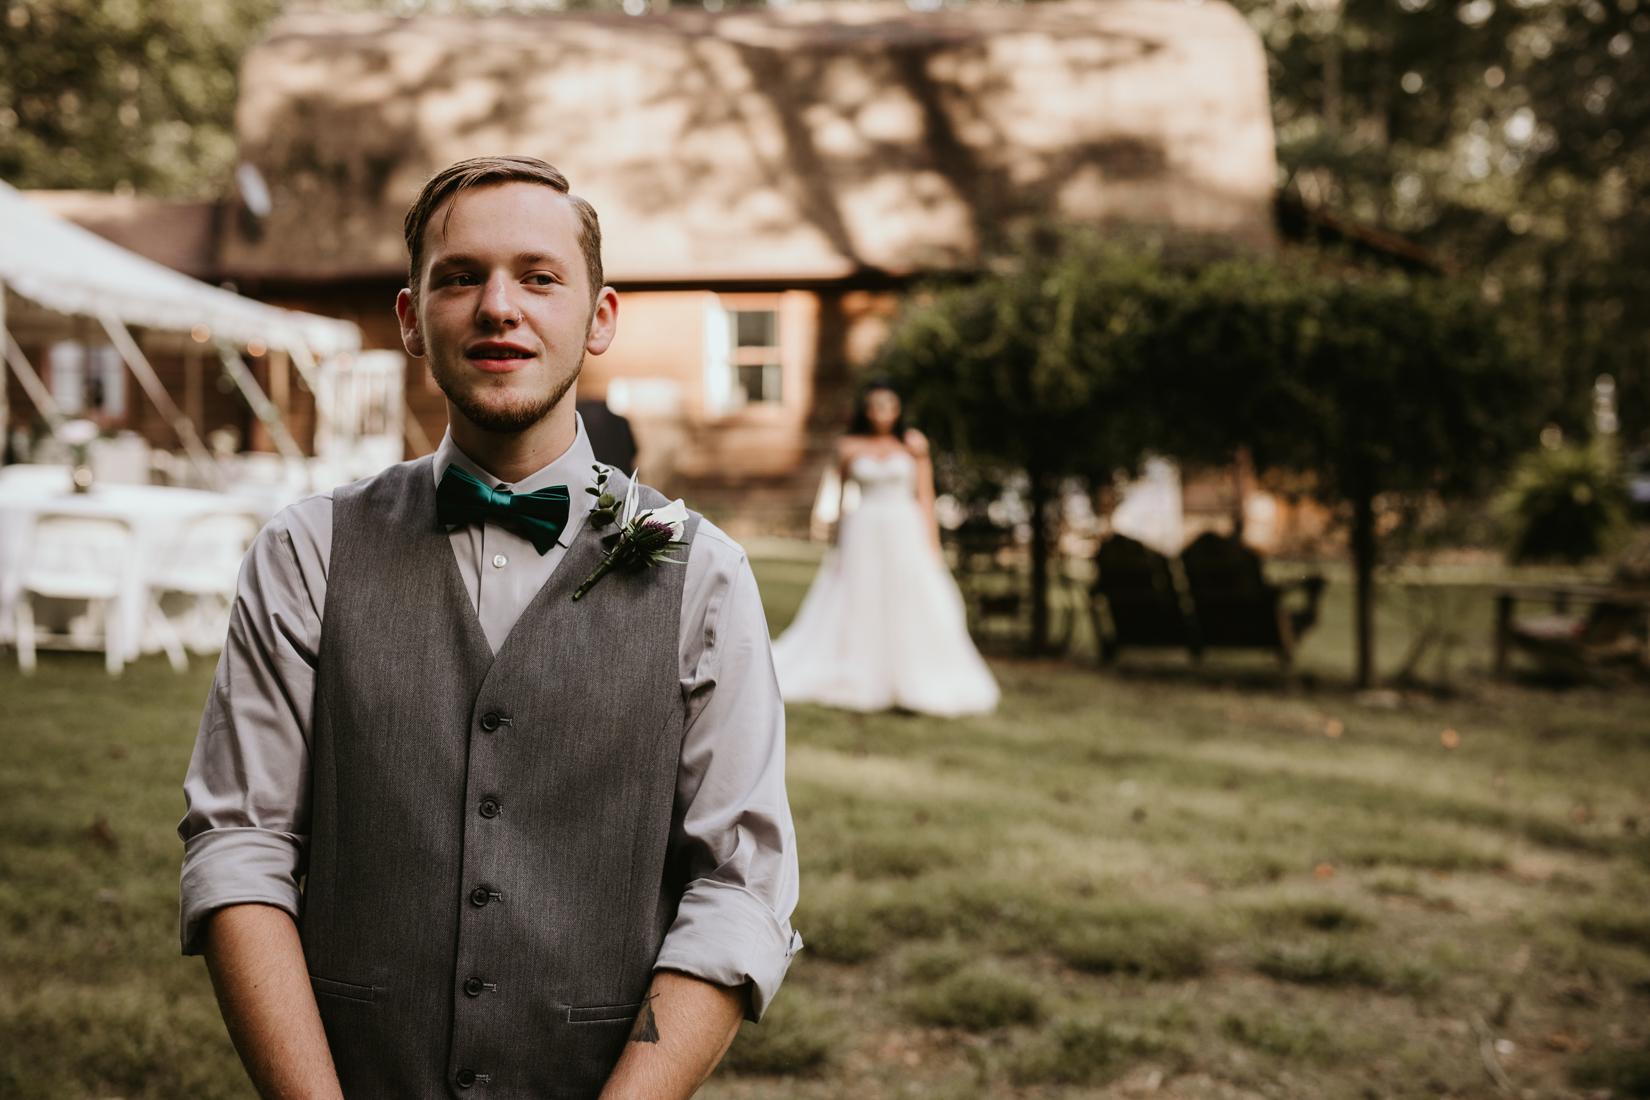 olivia_zay_wedding_09_2018-9460.jpg